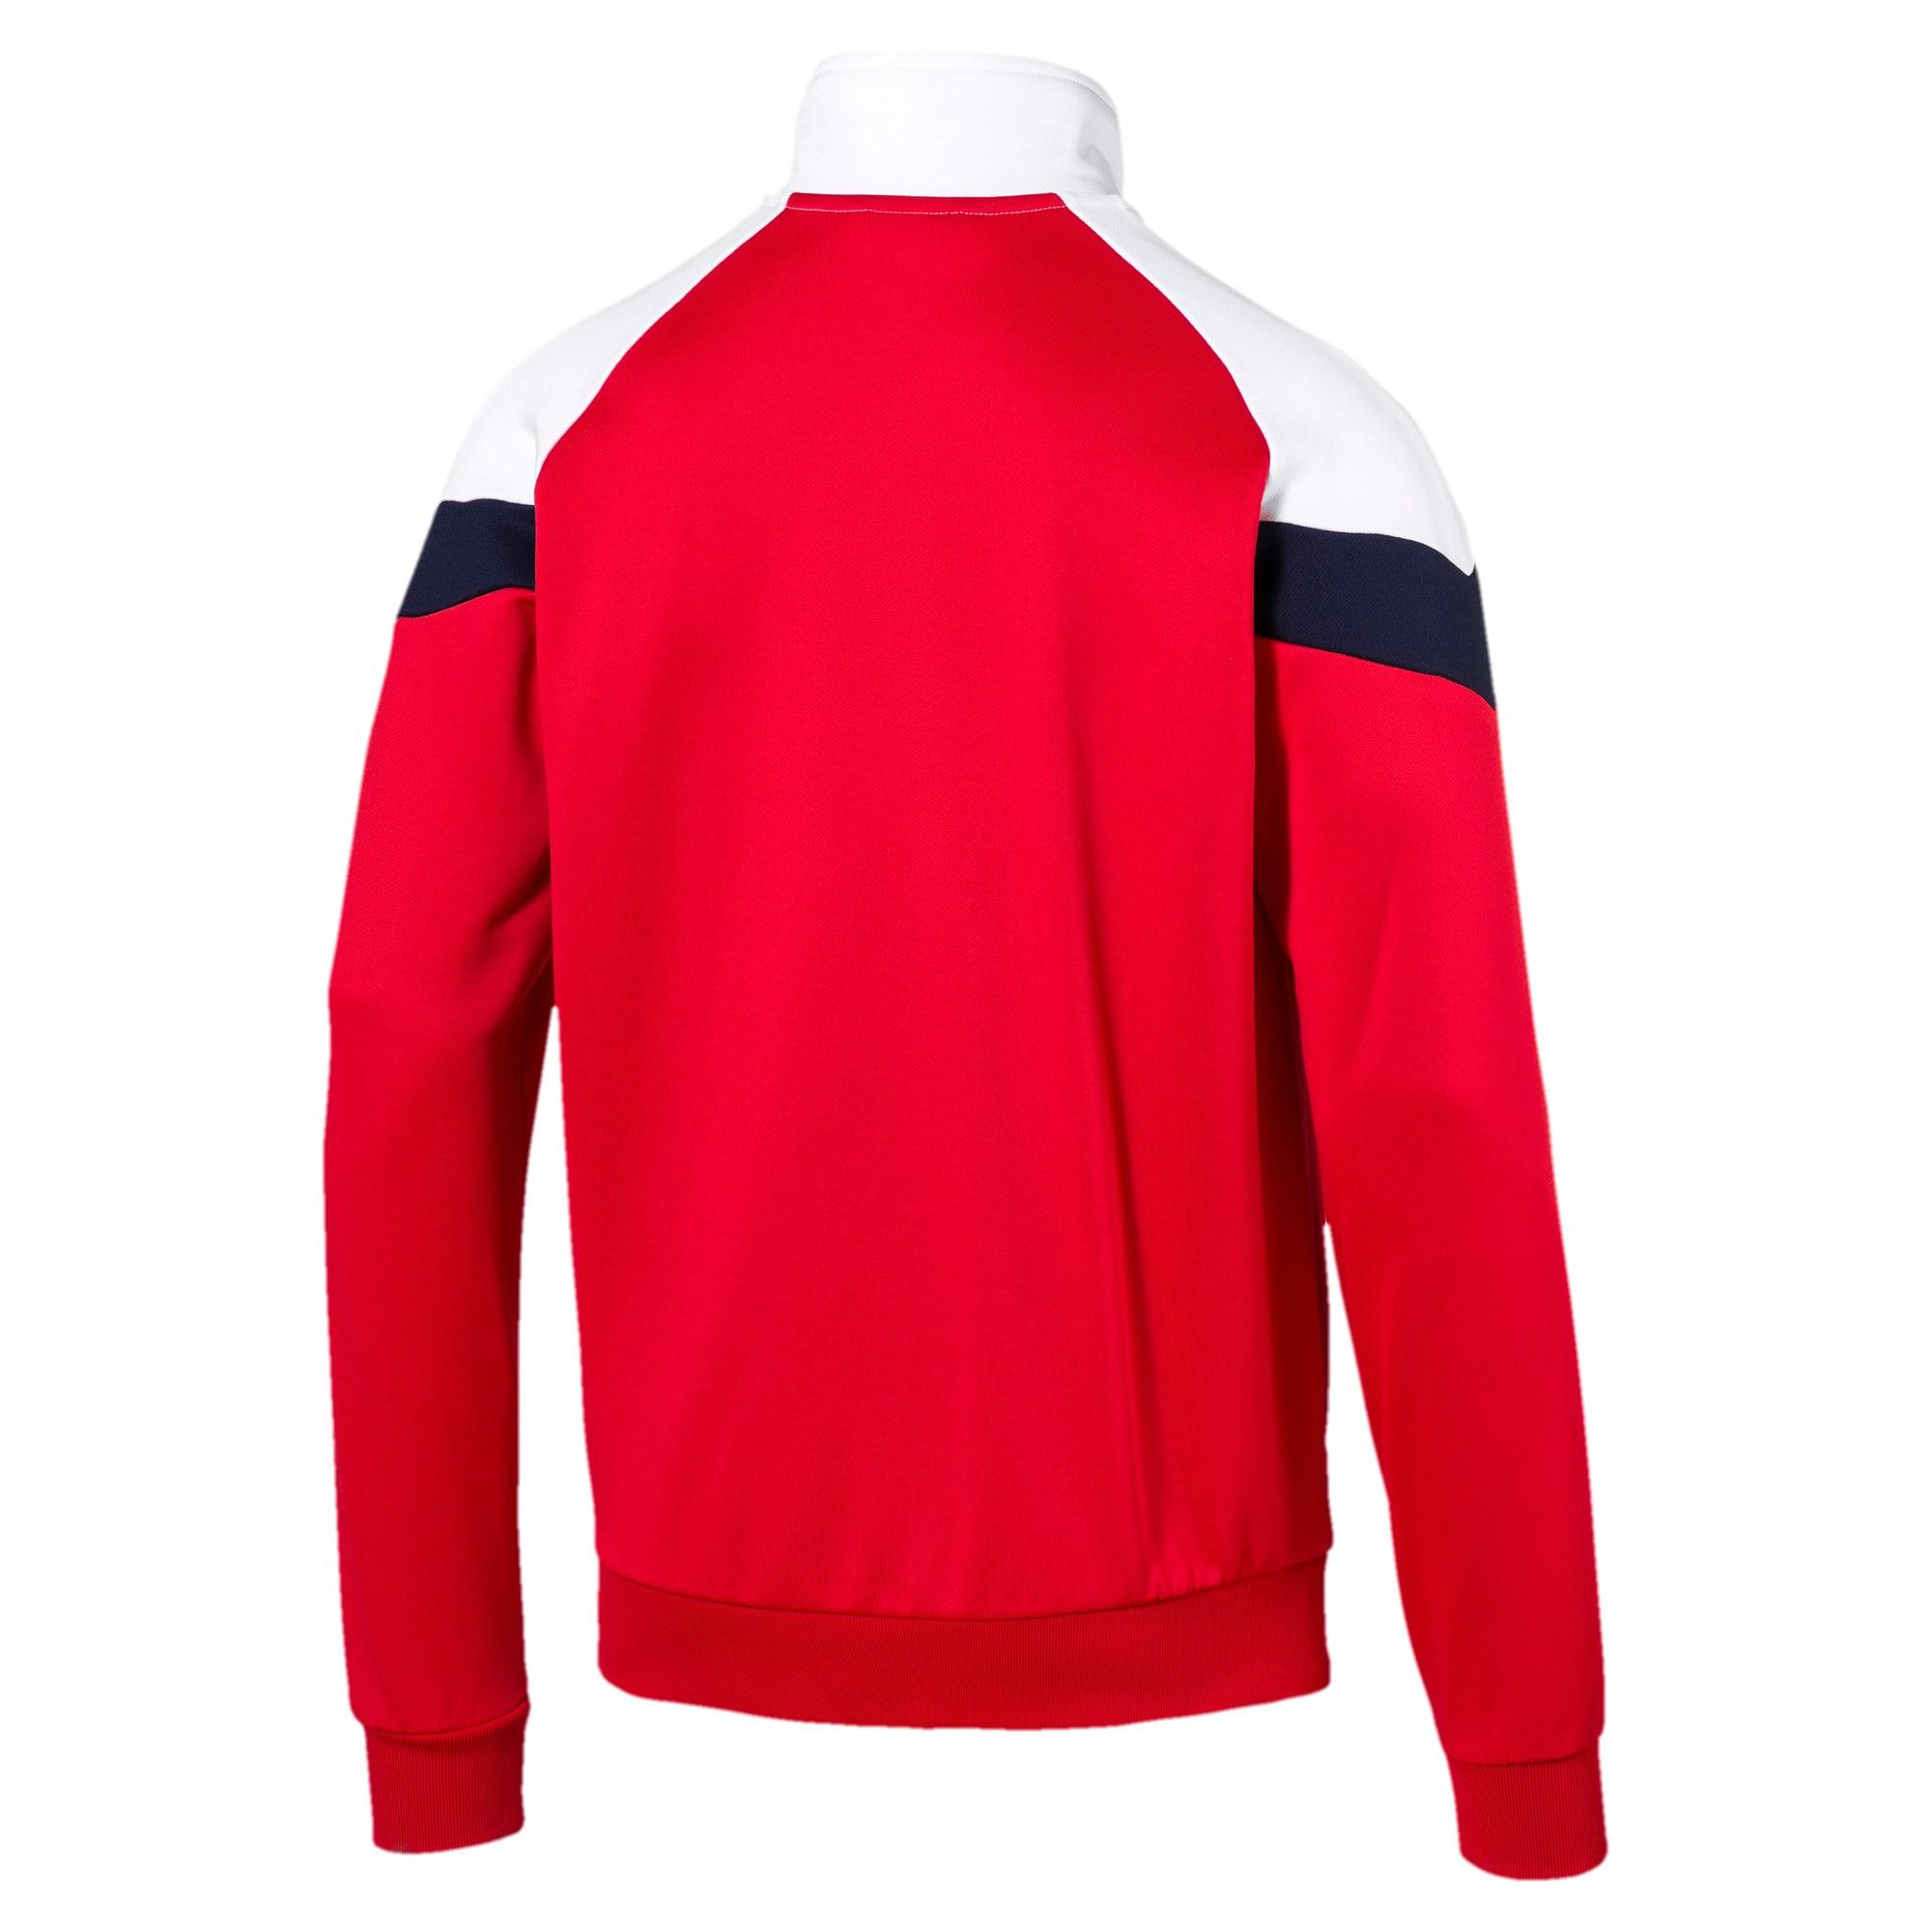 Thumbnail 4 of Iconic MCS Men's Track Jacket, High Risk Red, medium